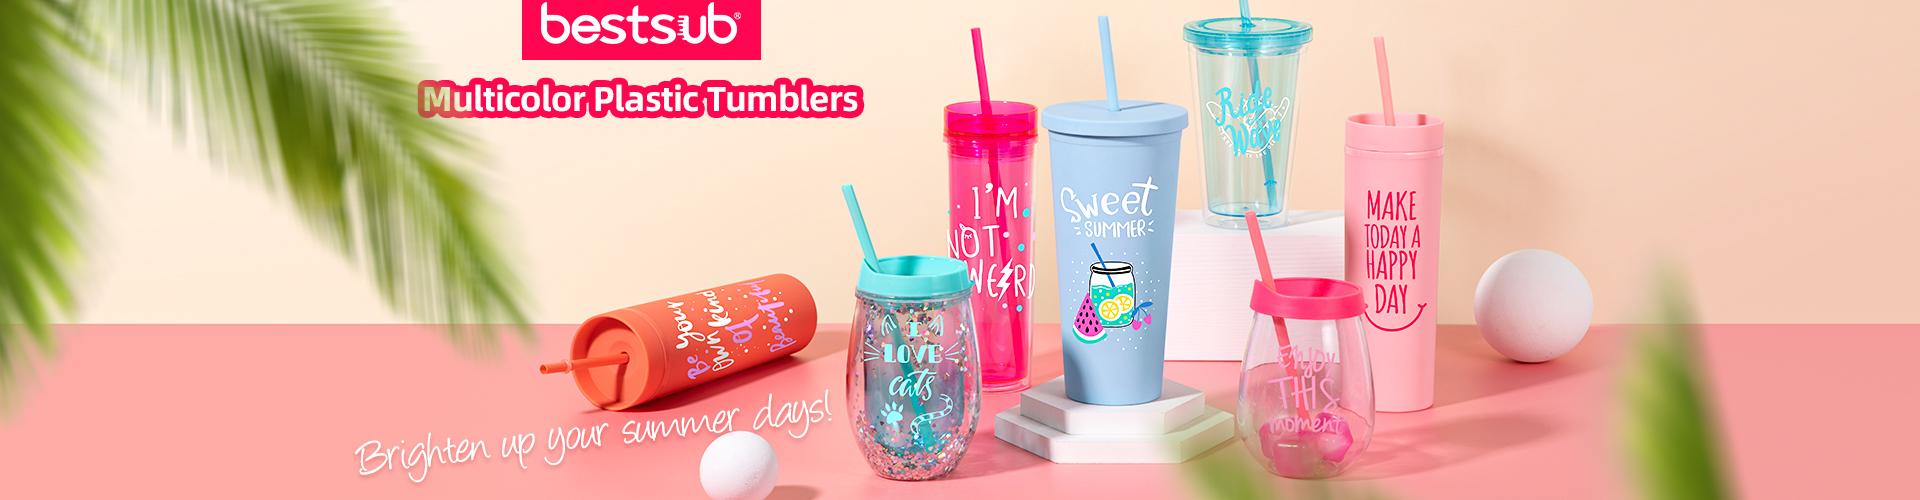 2021-01-26_Multicolored_Plastic_Tumblers_new_web